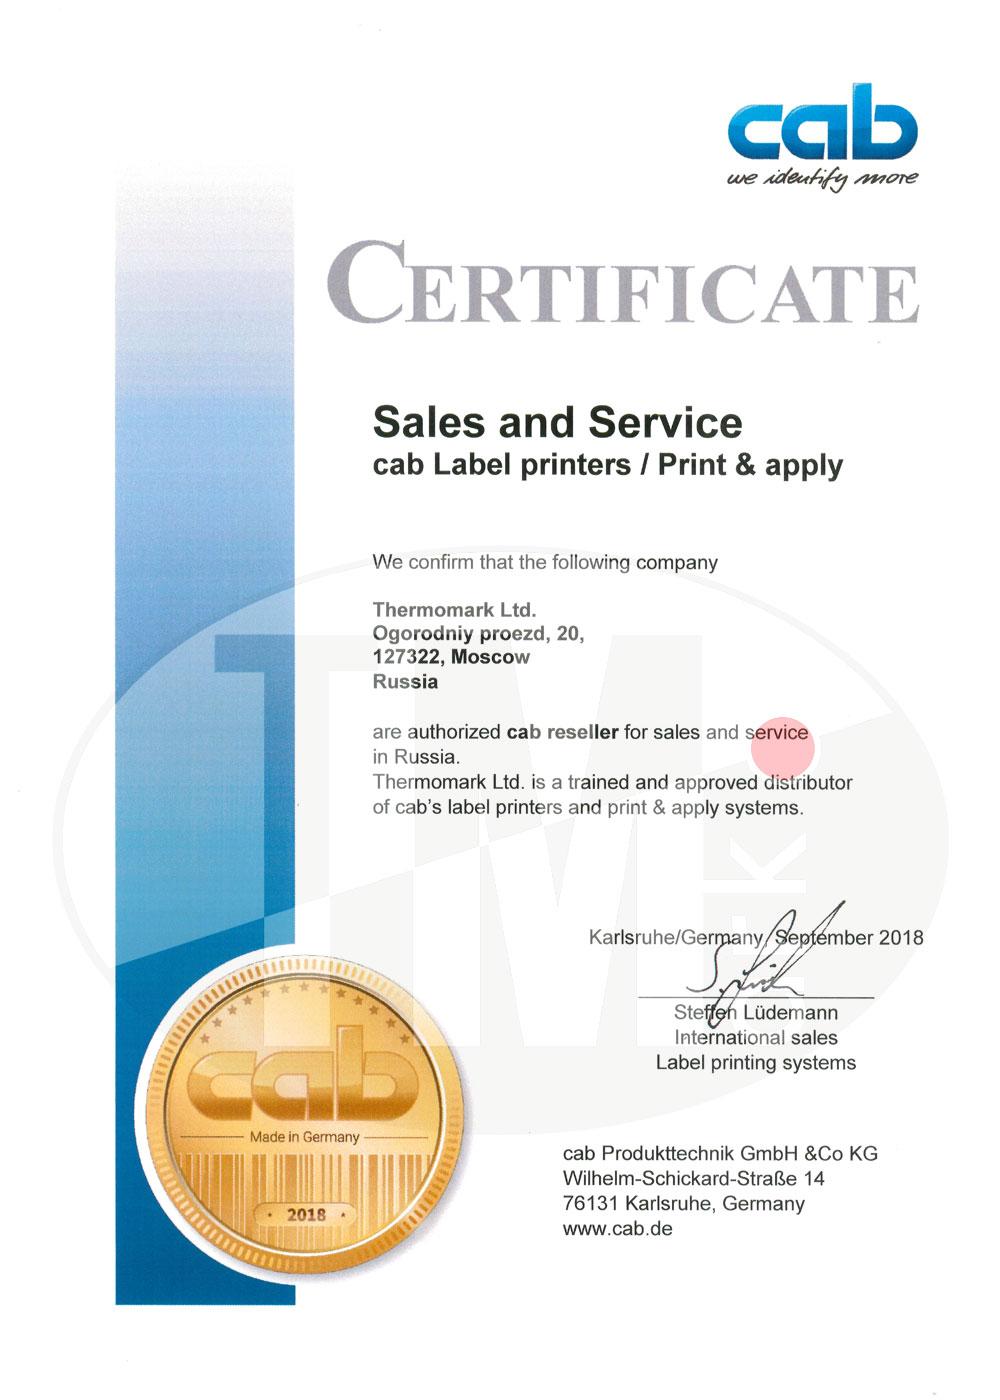 Сертификат дистрибьютора cab